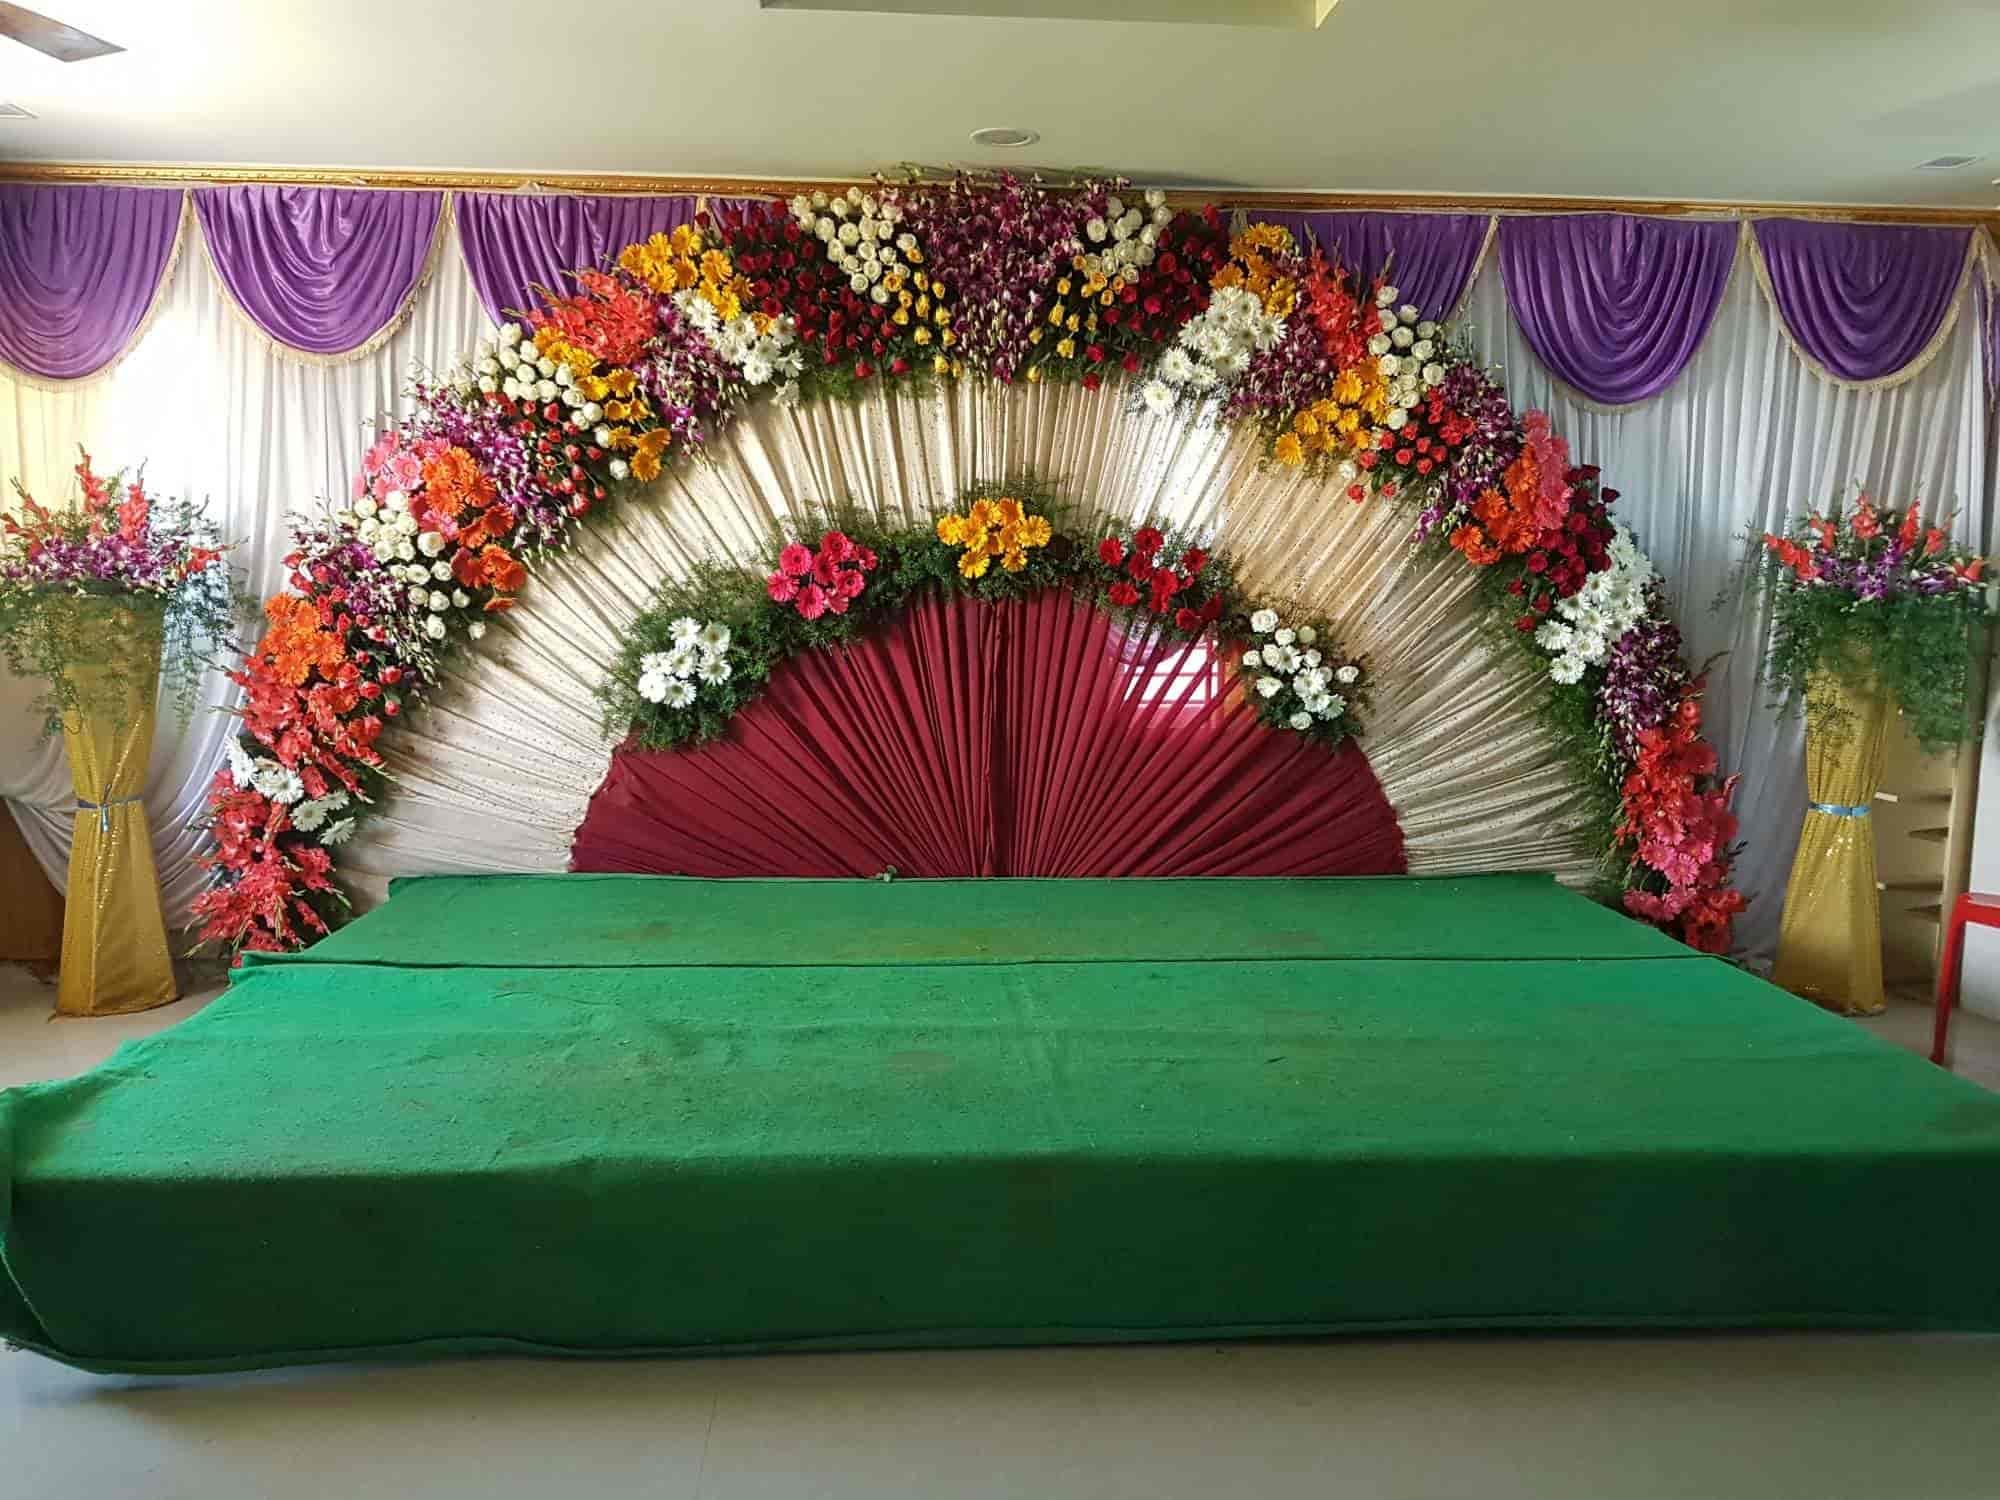 Sri Lakshmi Vinayaka Flower Decoration - Sri Lakshmi Vinayak Flower Decoration - Decorators in Madanapalle - Justdial